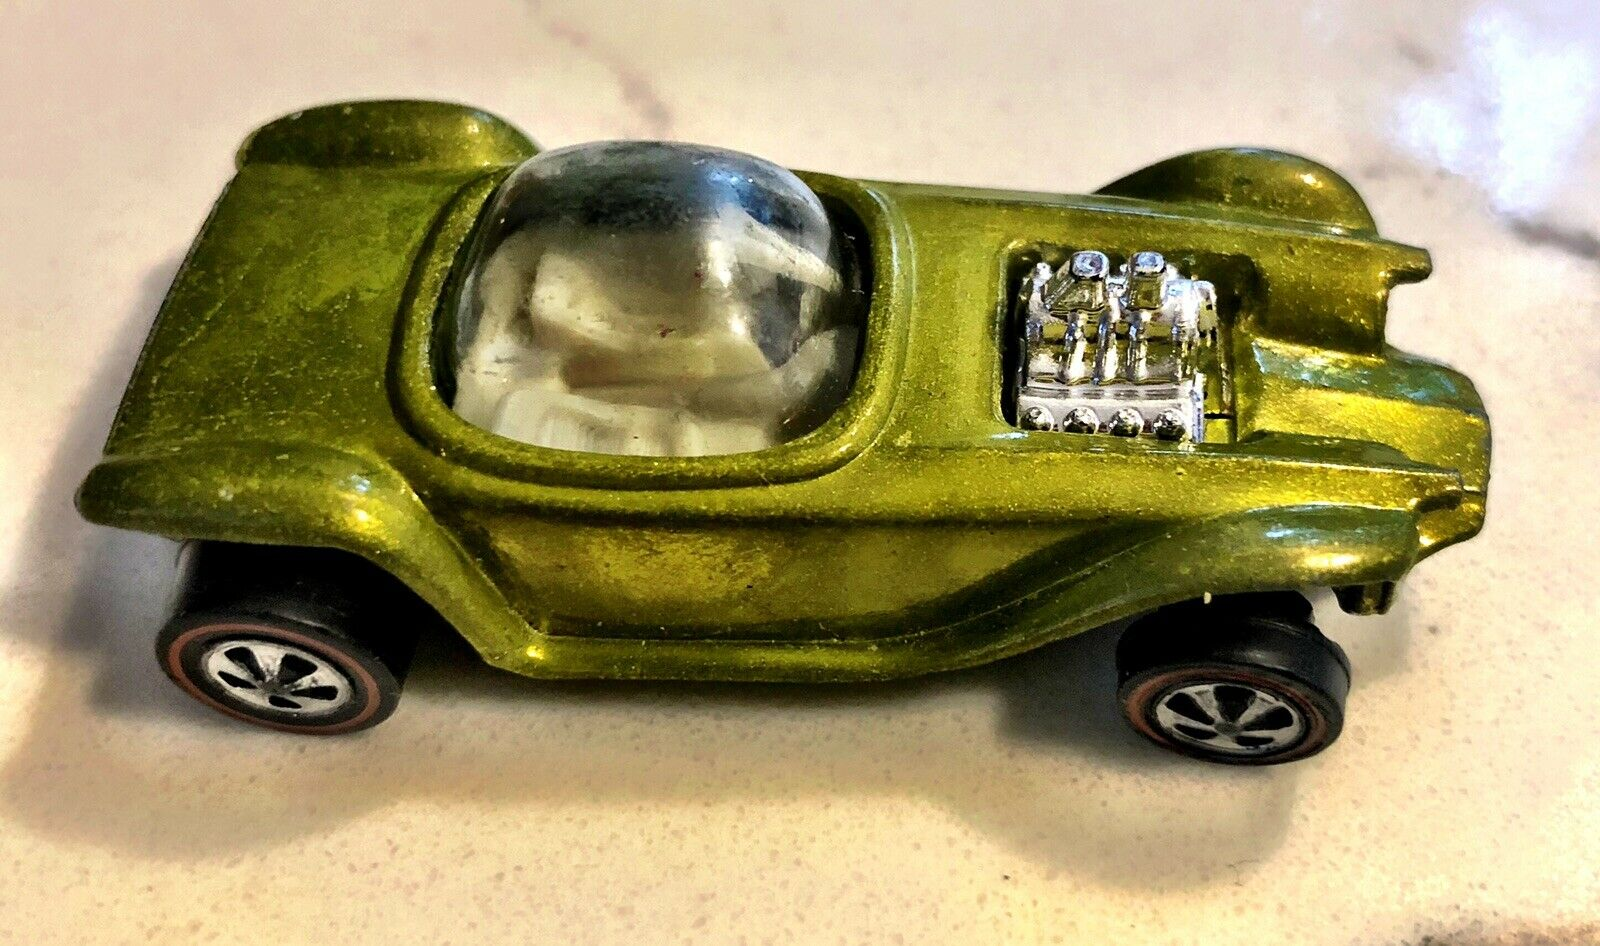 Redline Redline Redline Hot wheels 1968 Beatnik Bandit 101026